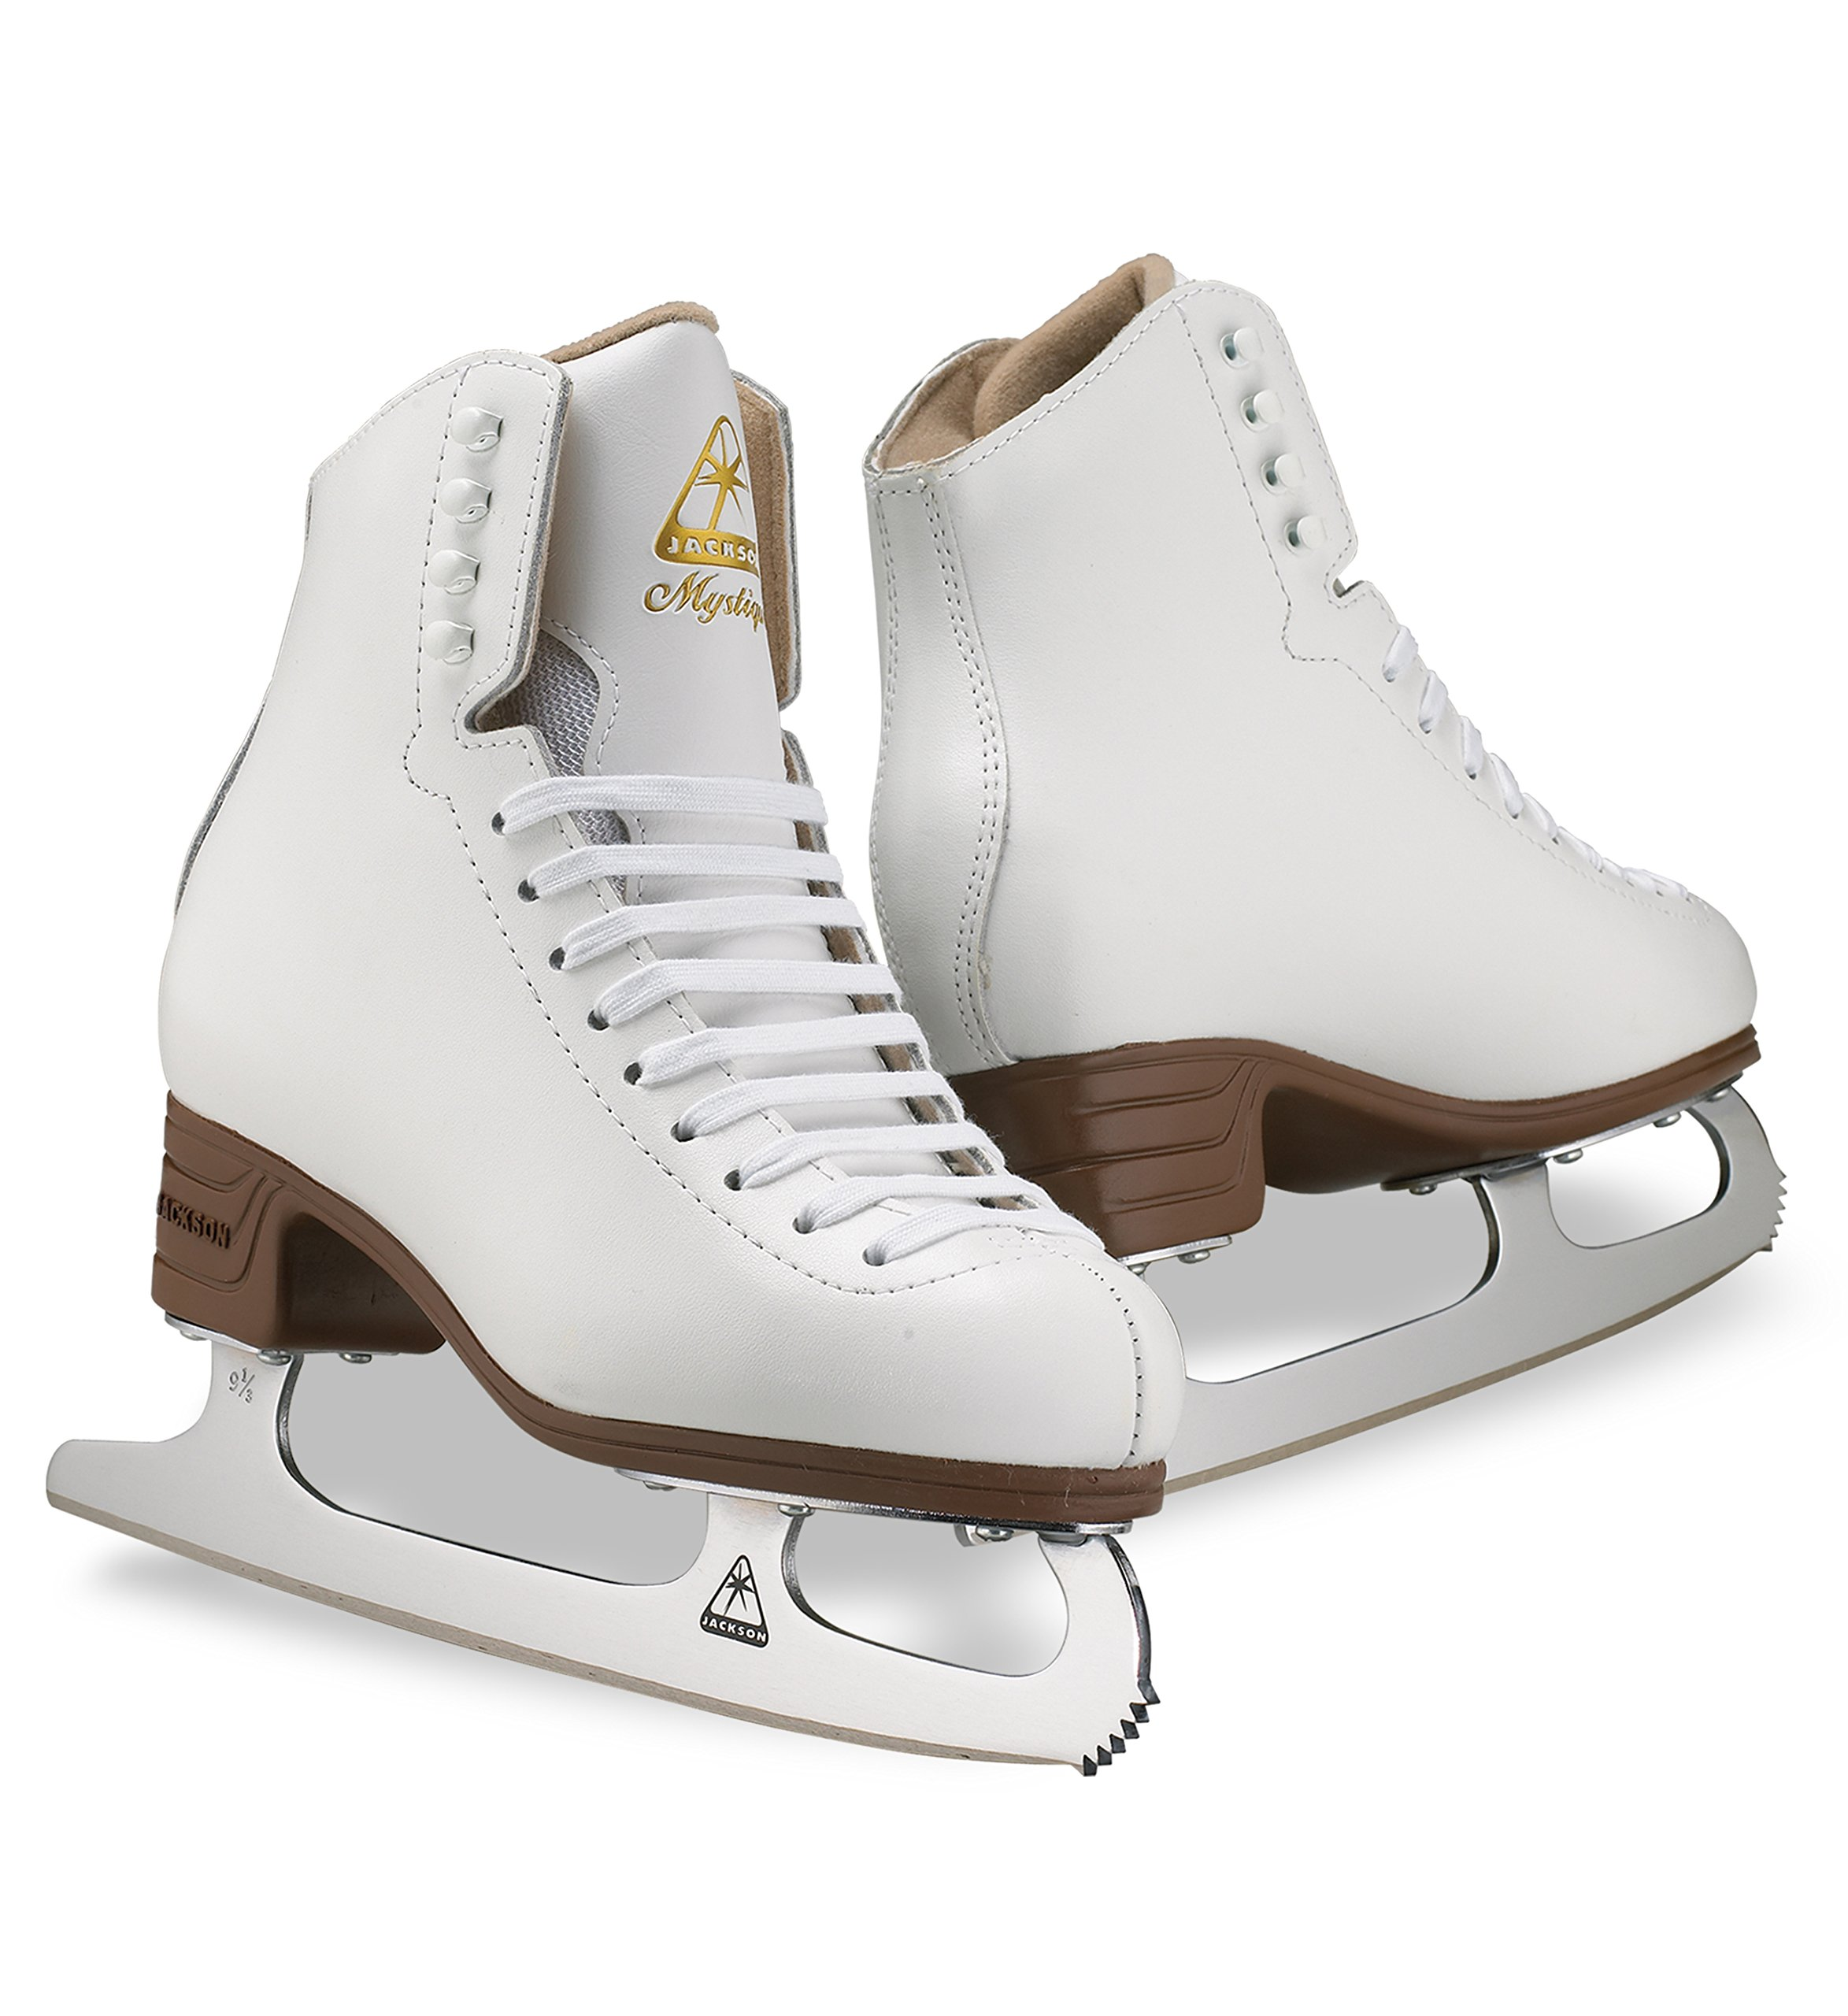 Jackson Ultima Mystique JS1491 White Kids Ice Skates, Size 2.5 by Jackson Ultima